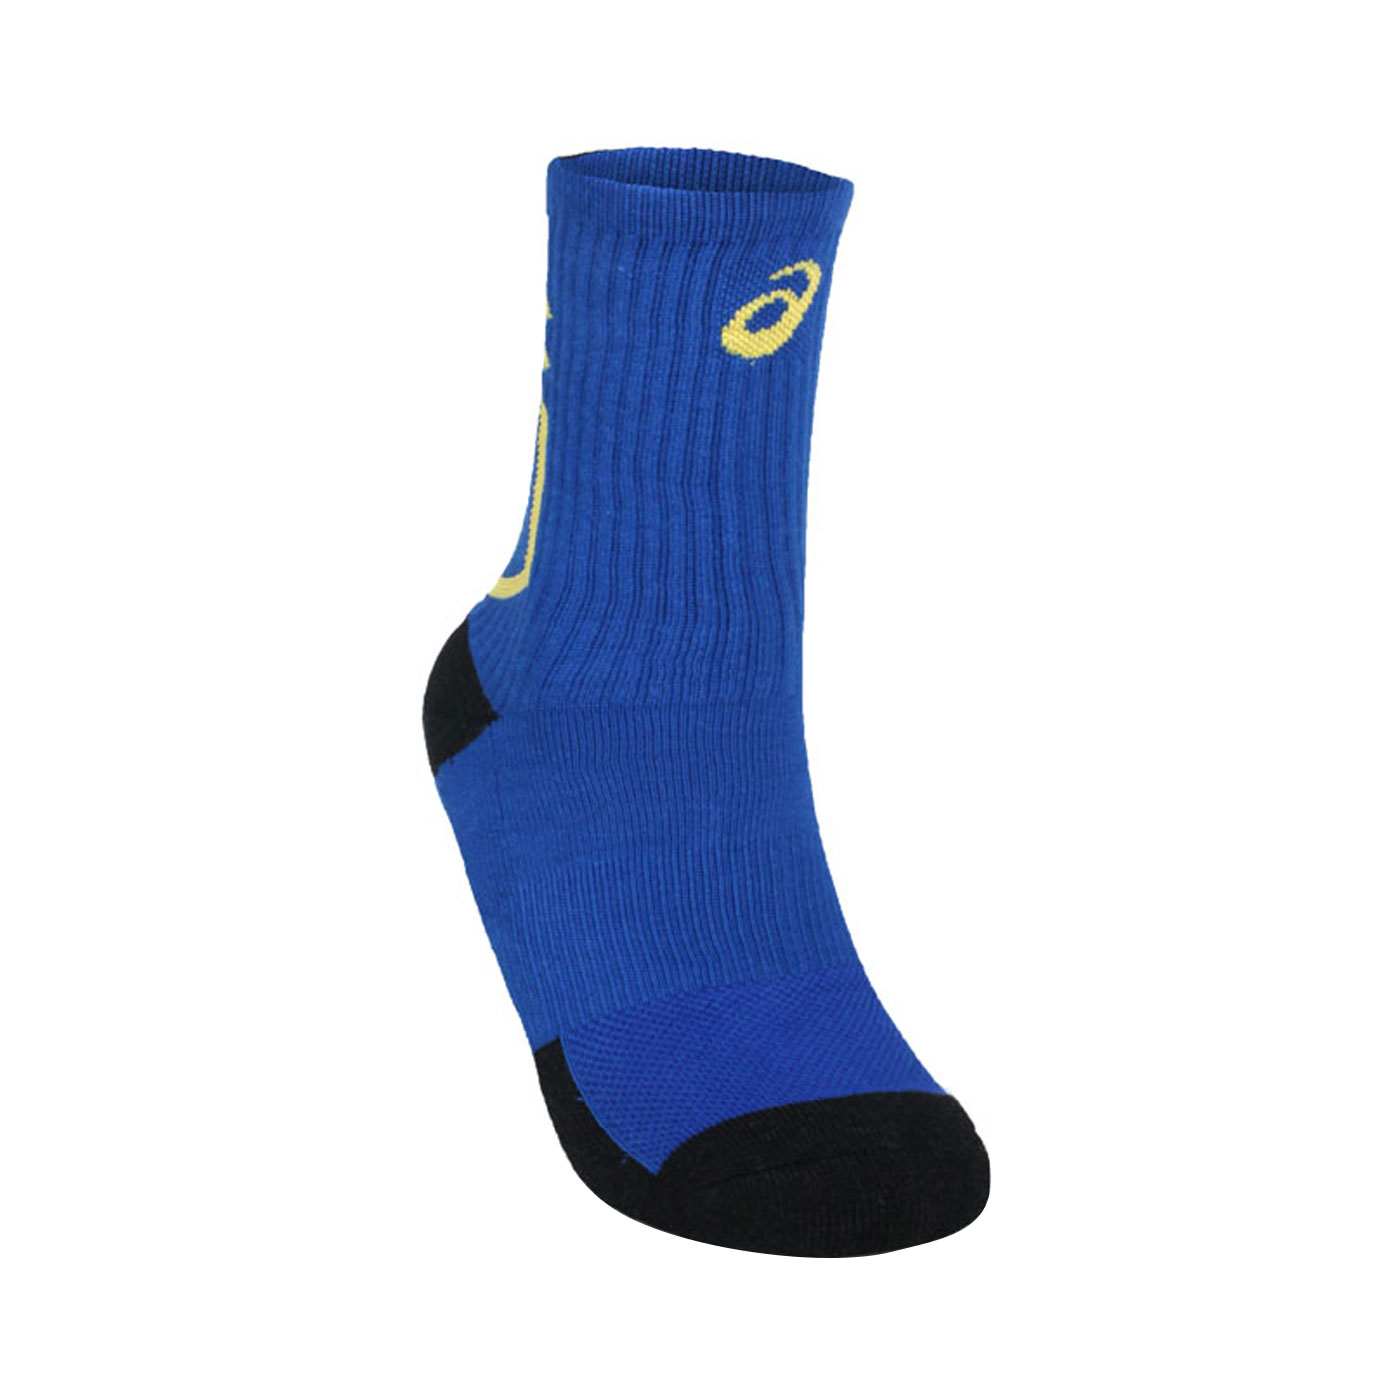 ASICS 運動中筒襪 Z32008-01 - 藍黃